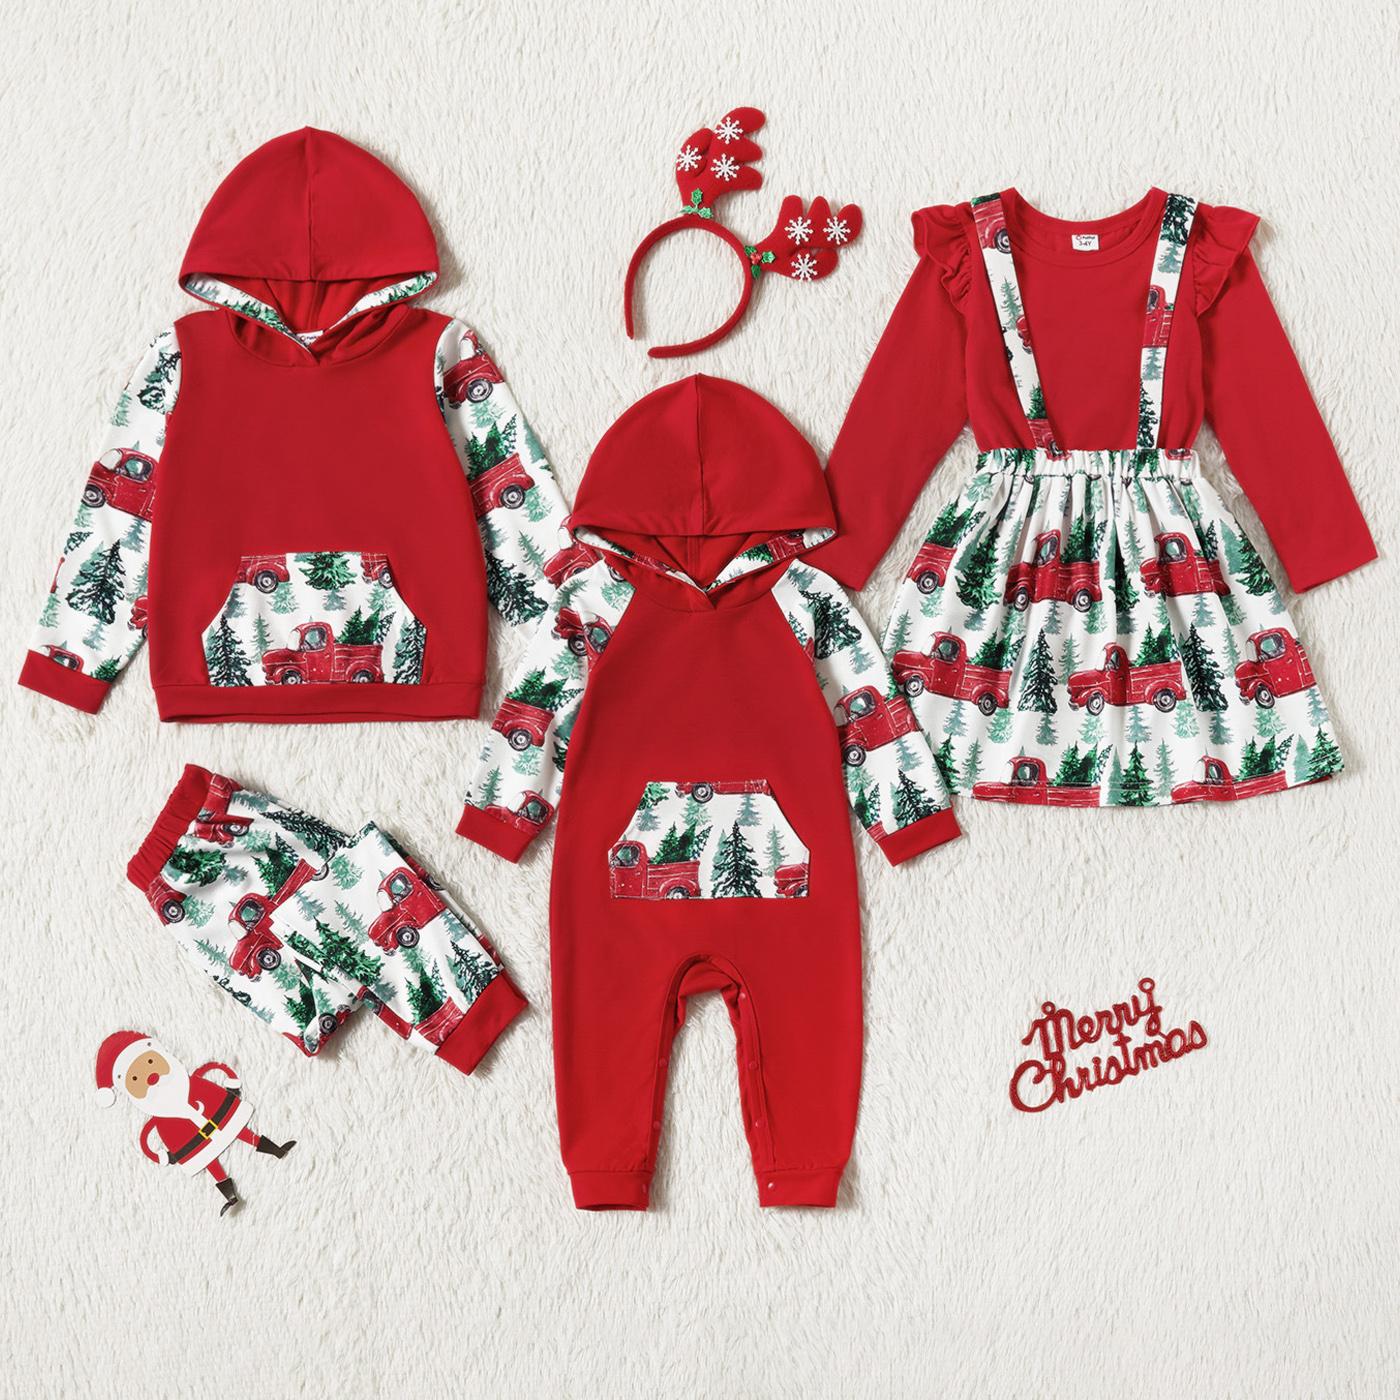 Christmas Tree and Car Print Splicing Red Sibling Matching Long-sleeve Sets